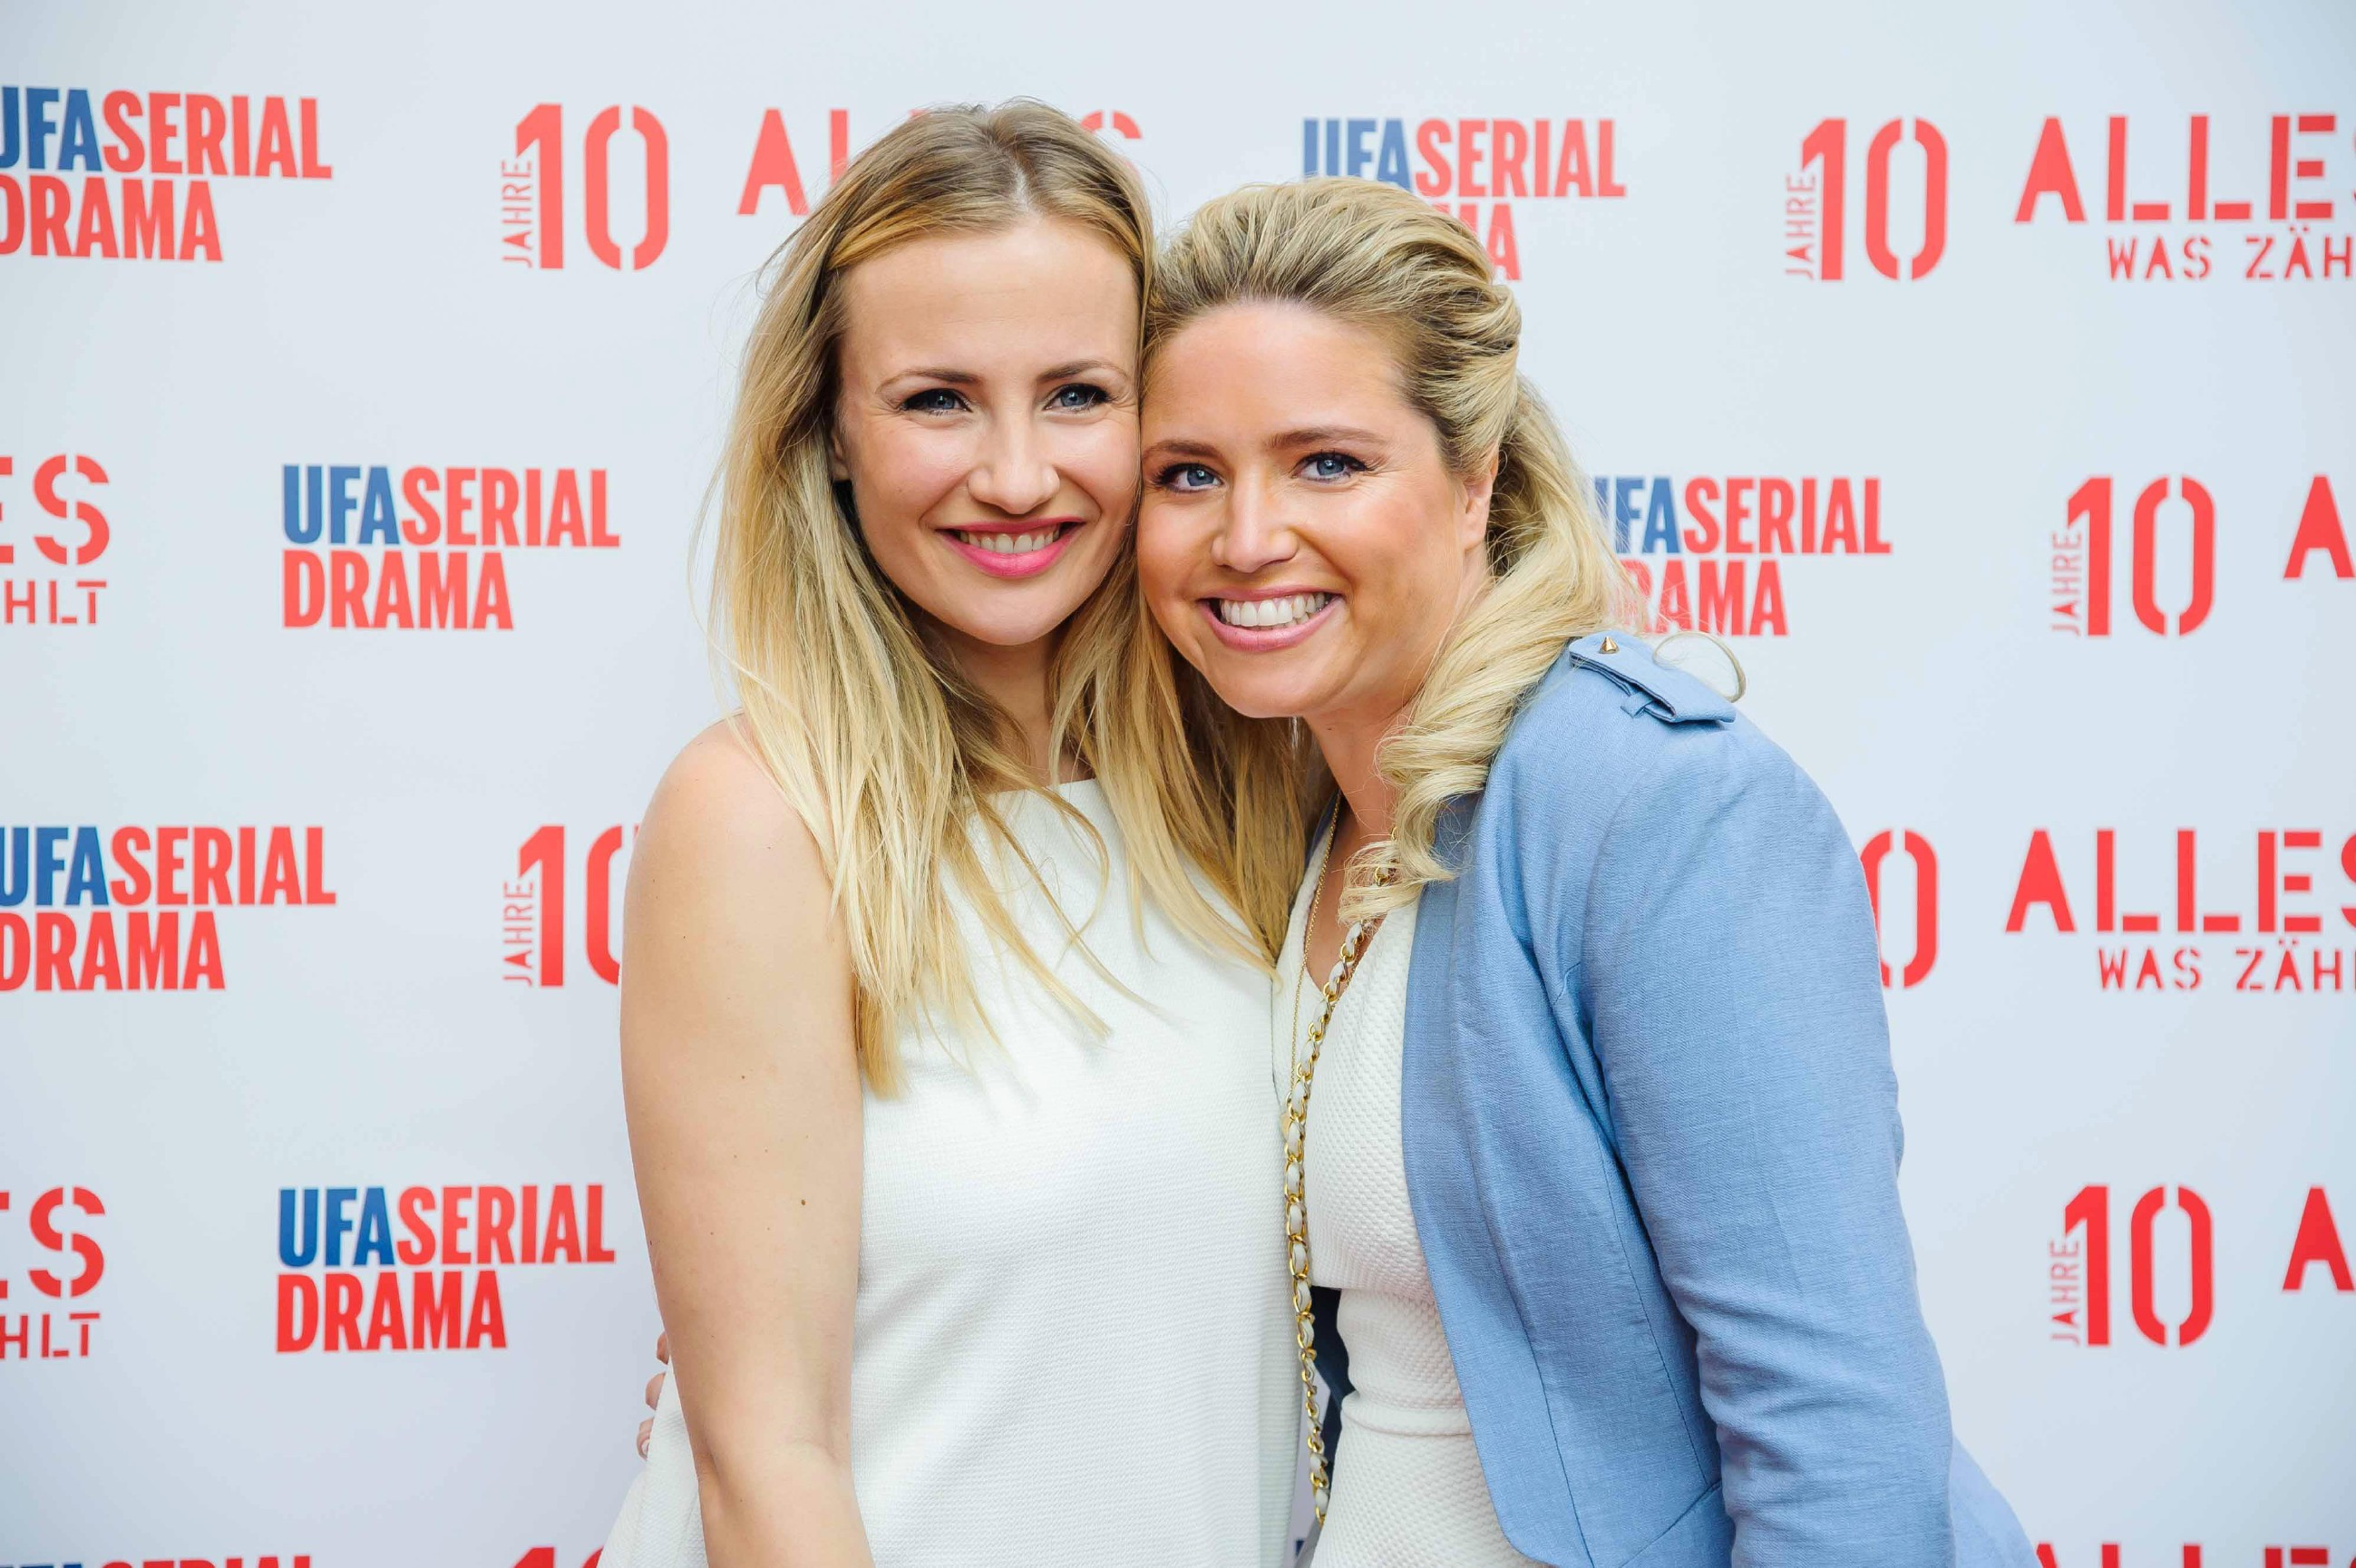 v.l.: Ania Niedieck und Caroline Frier